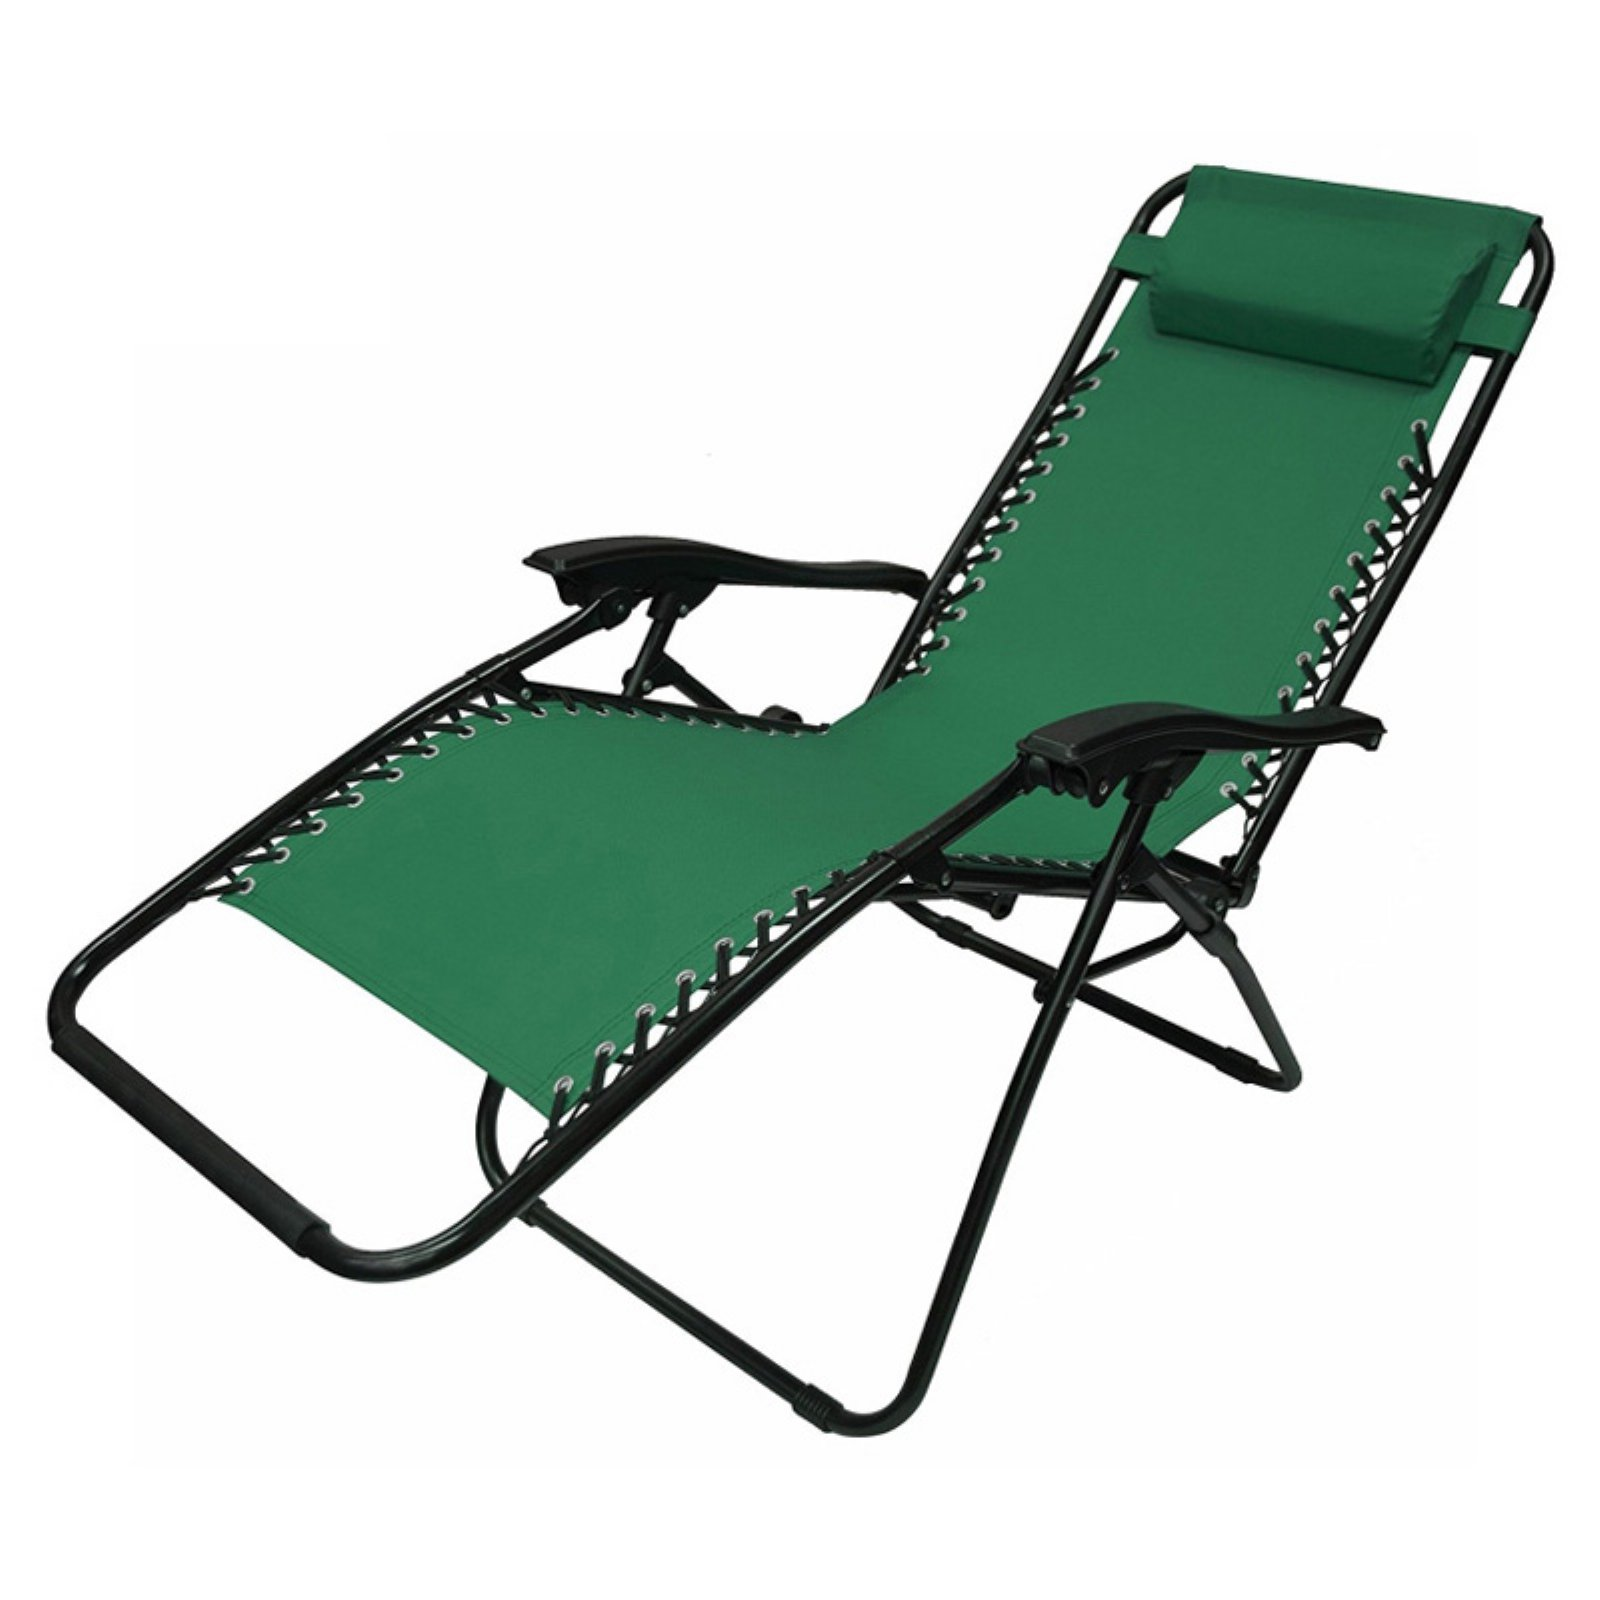 ALEKO Outdoor Patio Foldable Chaise-Longue Leisure Pool Beach Chair